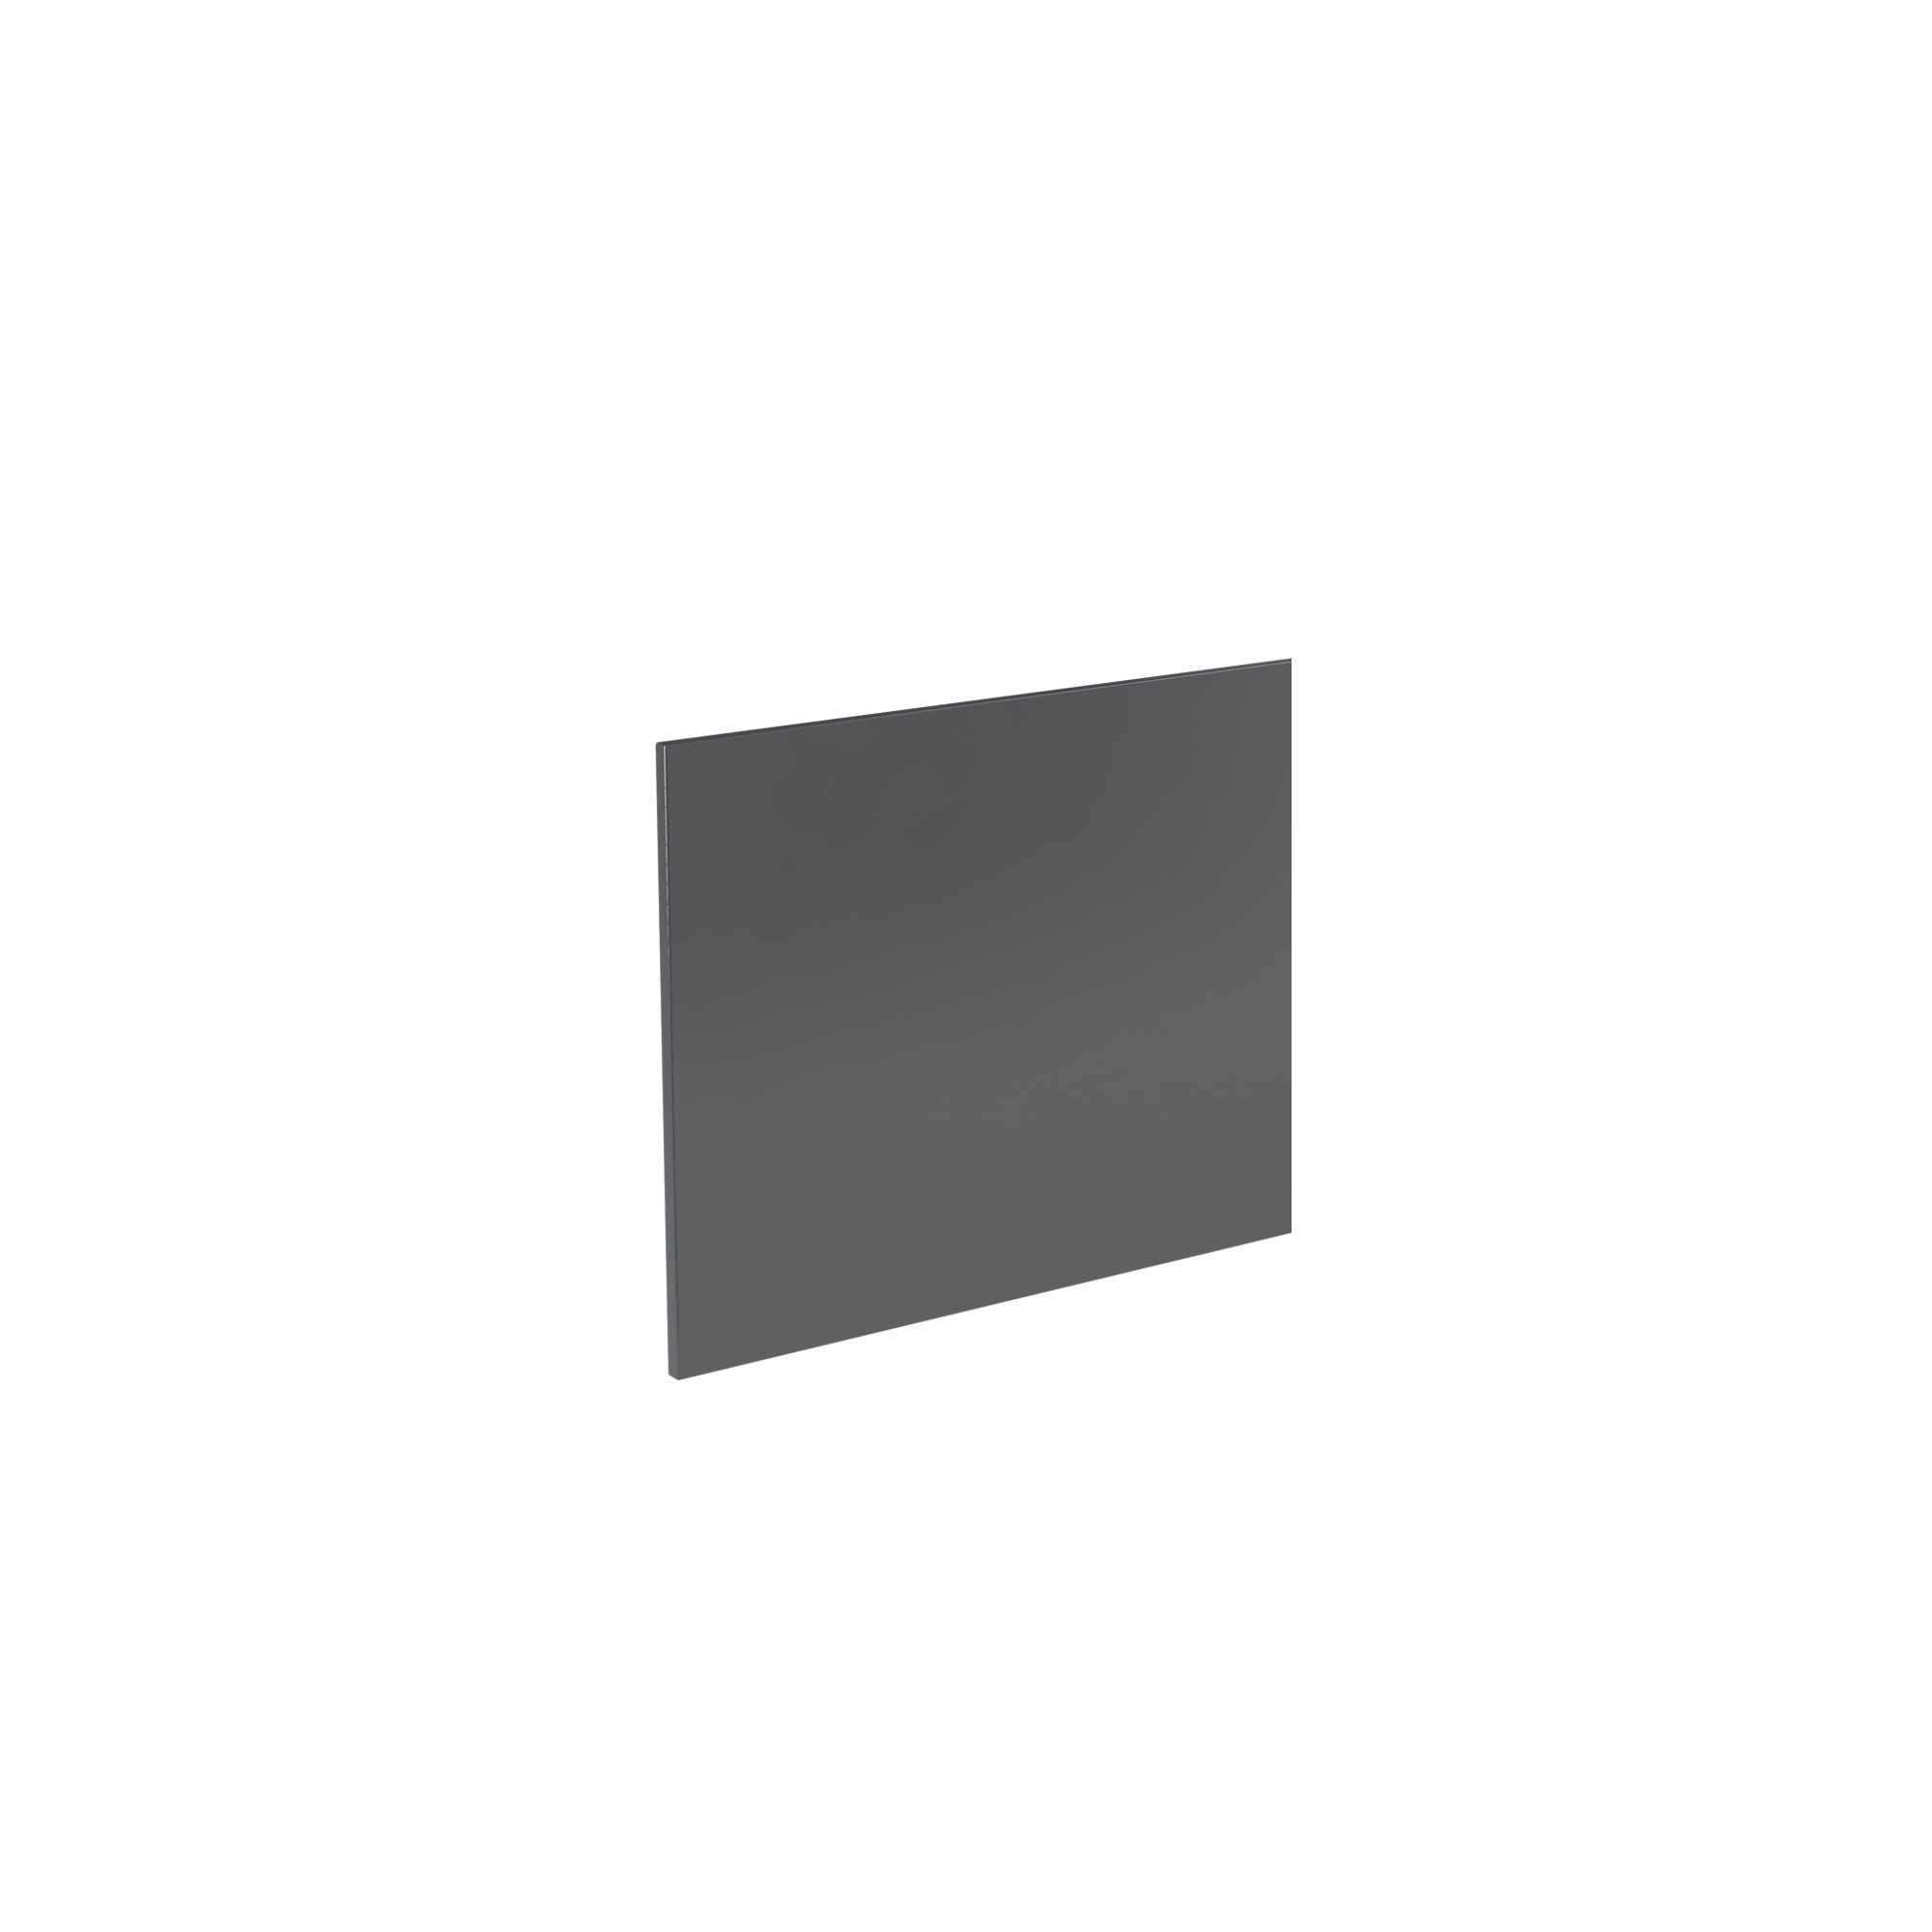 K-Vit Ikon 800mm Bath Panel - Gloss Grey